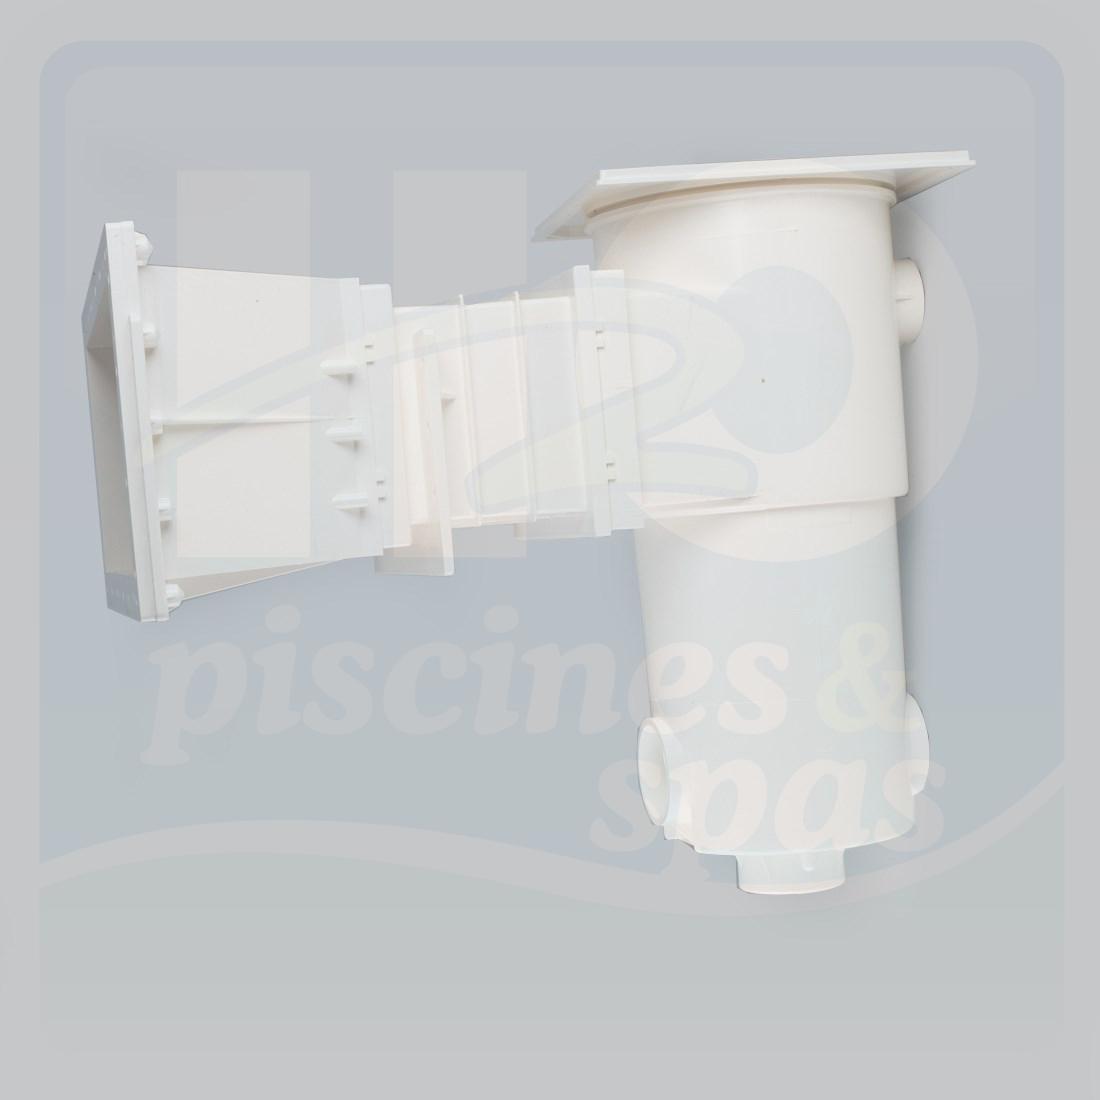 Skimmer AQUAREVA long Grande meurtrire pour piscine bois de 45 mm Blanc H2o Piscines& Spas # Piscine Bois Blanc